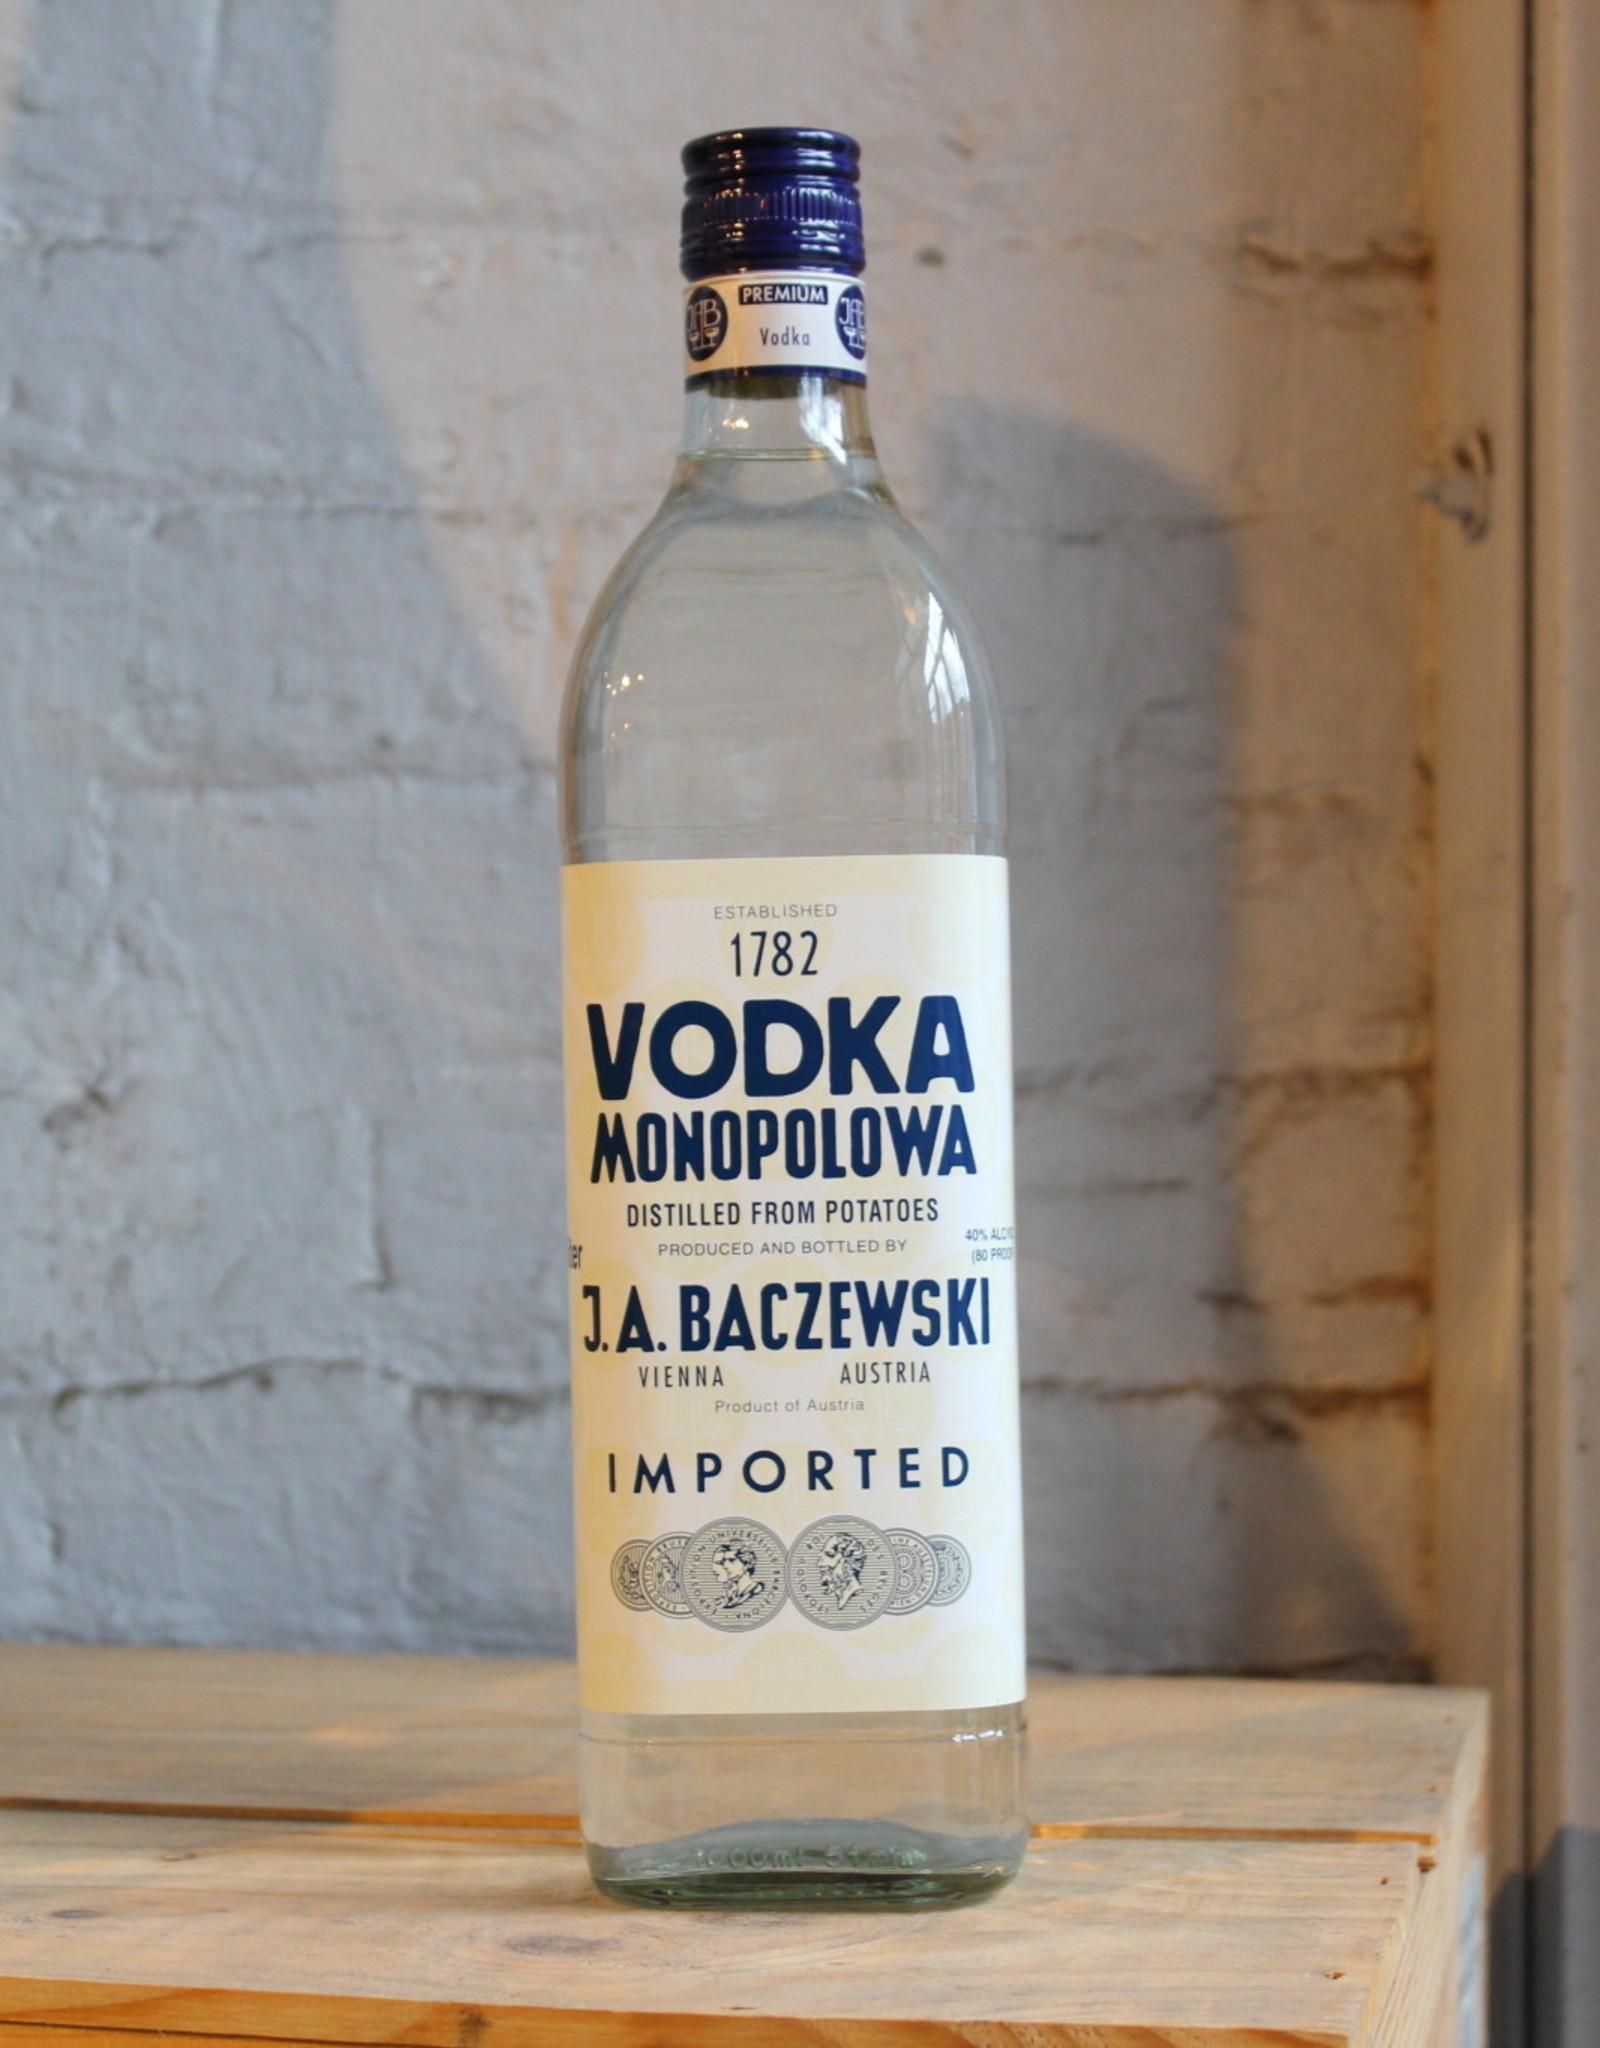 Monopolowa Vodka - Vienna, Austria (1Ltr)